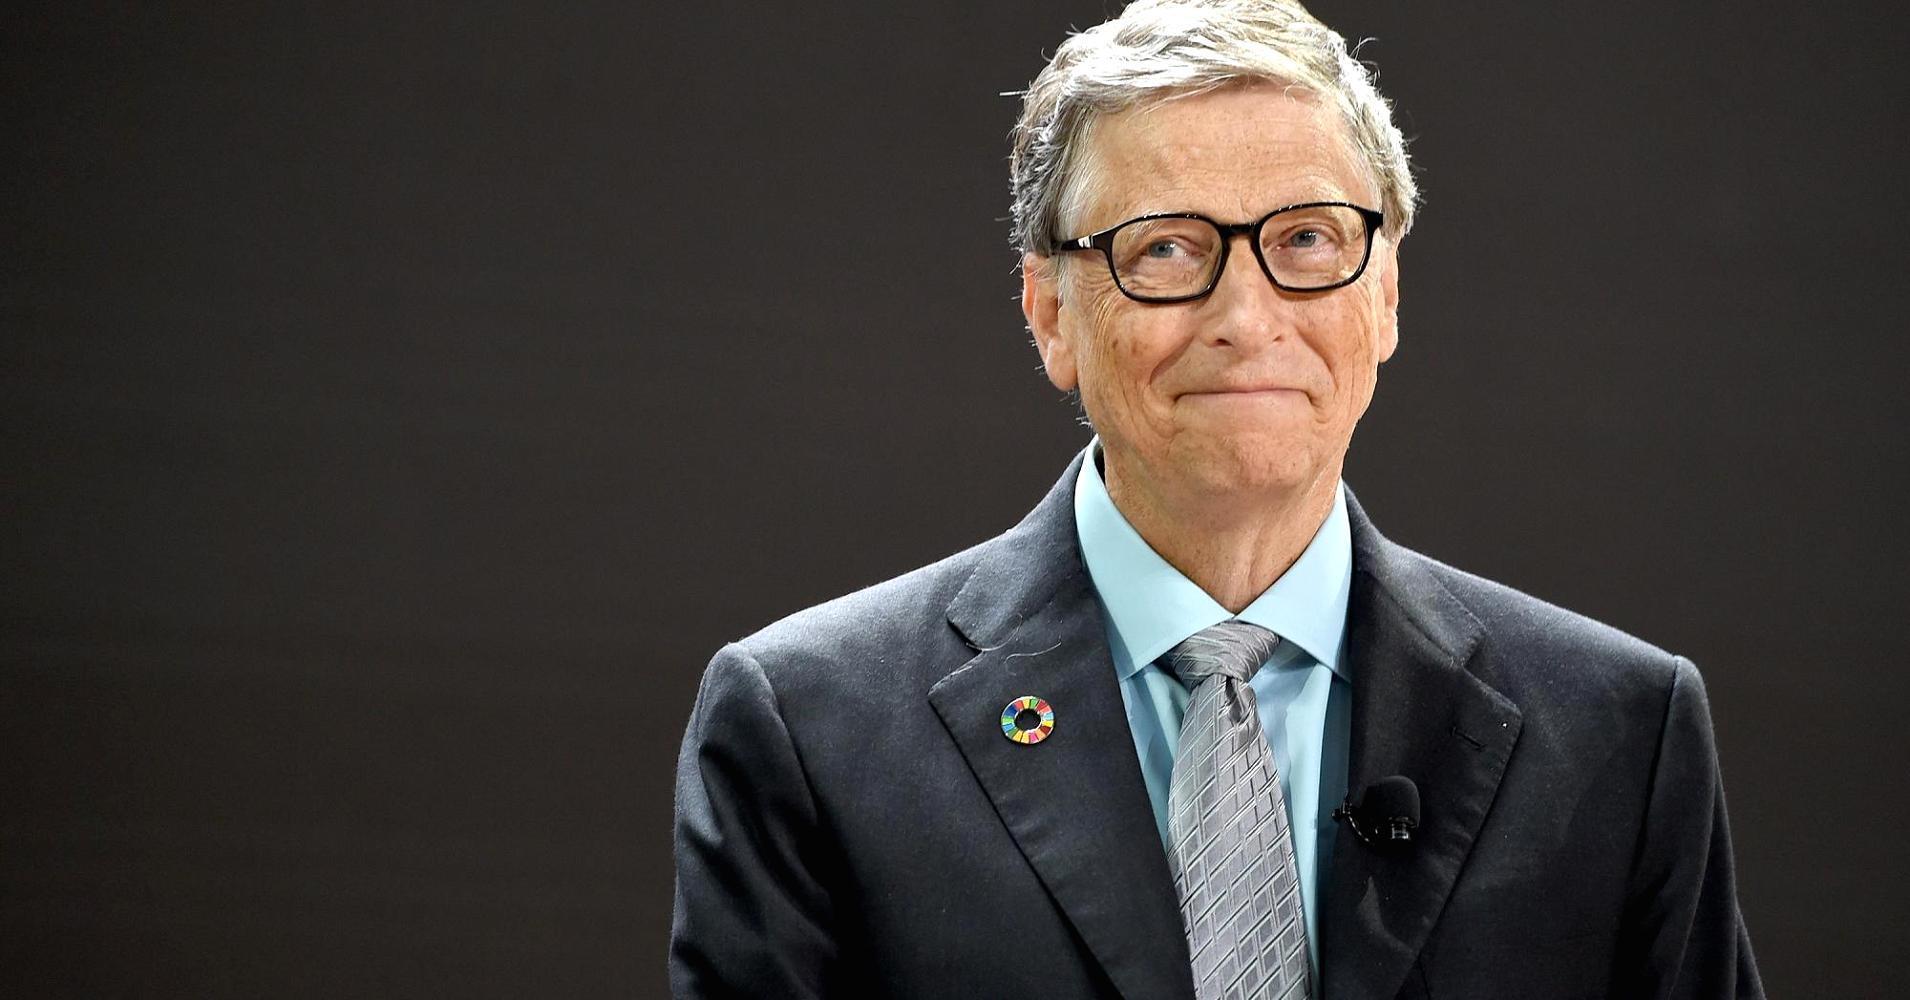 Image result for 4. 微软创始人Bill Gates(比尔·盖茨)